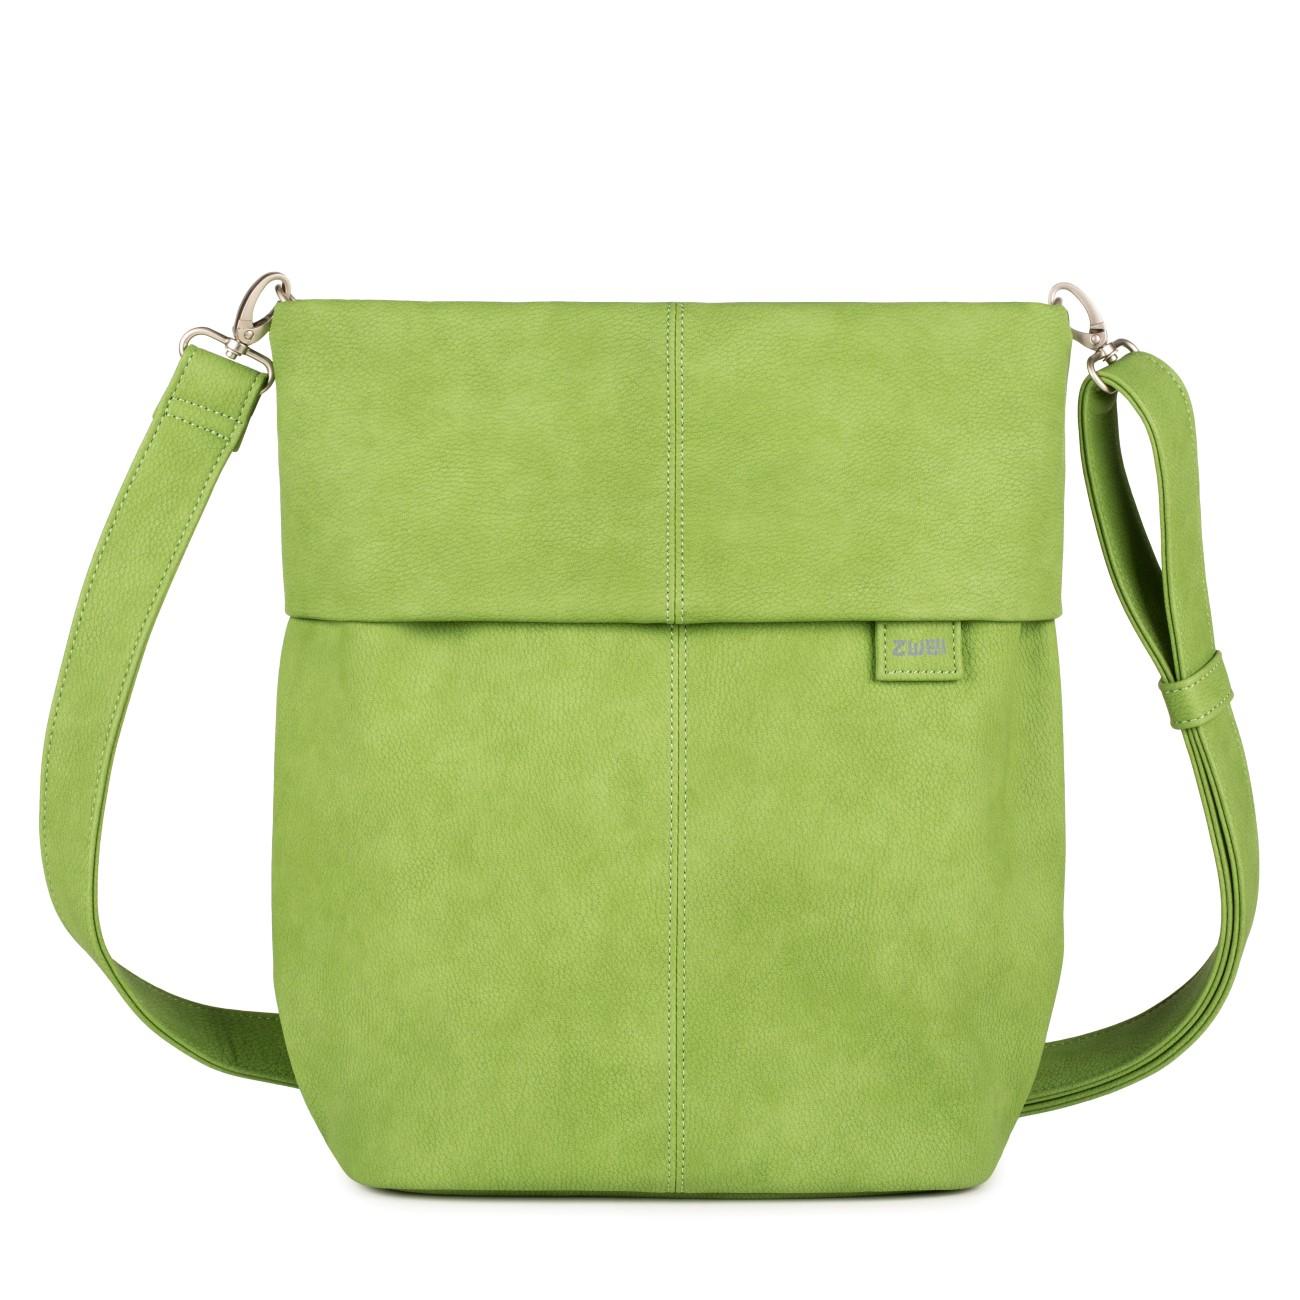 zwei umh ngetasche mademoiselle m12 nubuk green. Black Bedroom Furniture Sets. Home Design Ideas